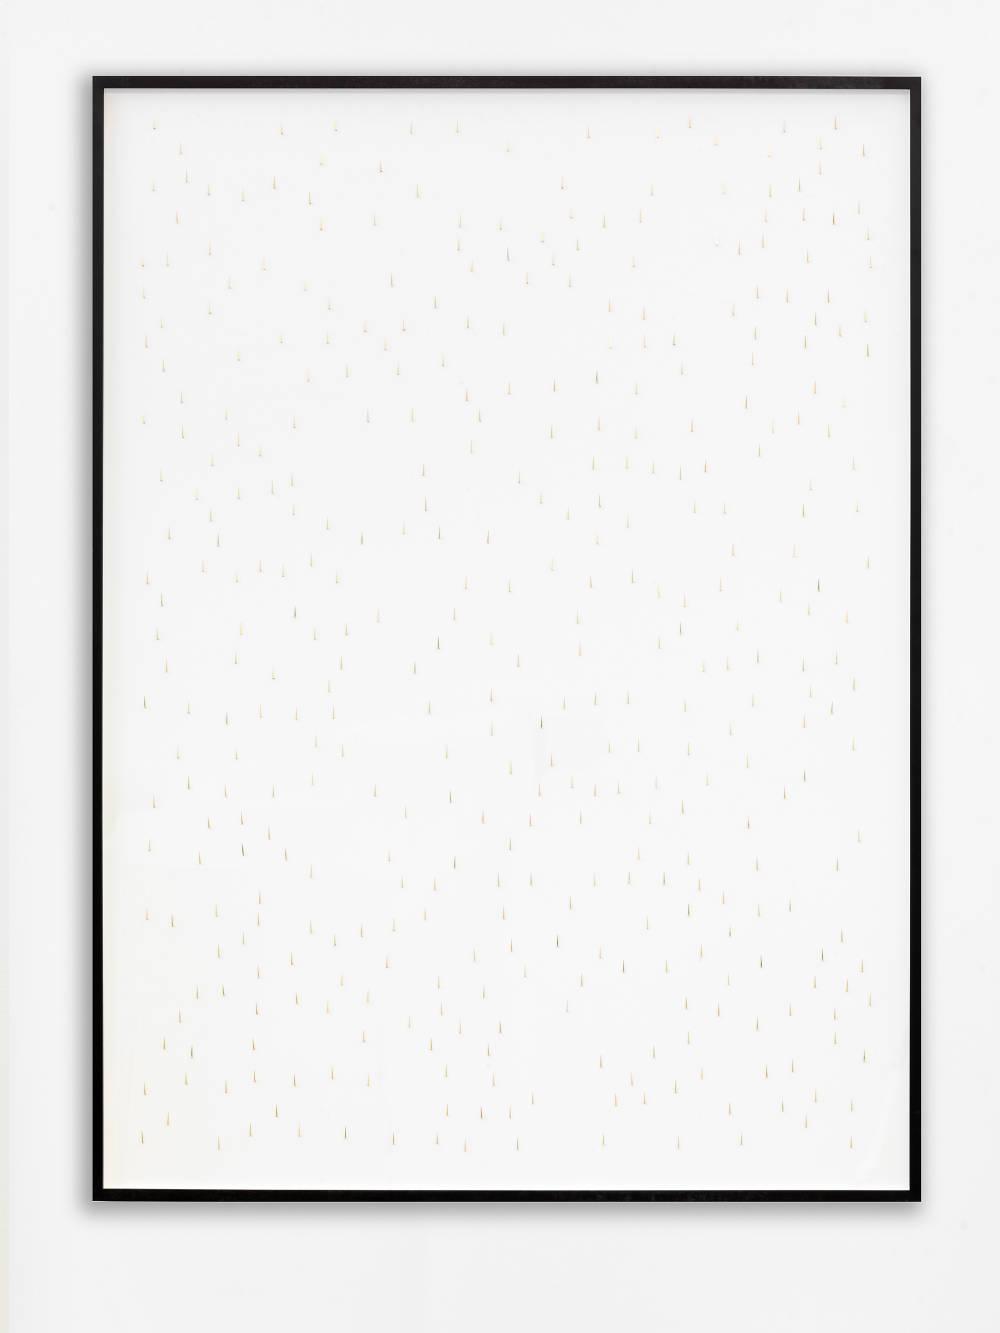 Alicja Kwade, Rain (7 minutes/ 0 cm), 2019. Clock hands on paper 52 1/4 x 38 7/8 x 1 7/8 inches (132.7 x 98.7 x 4.8 cm) framed. Unique